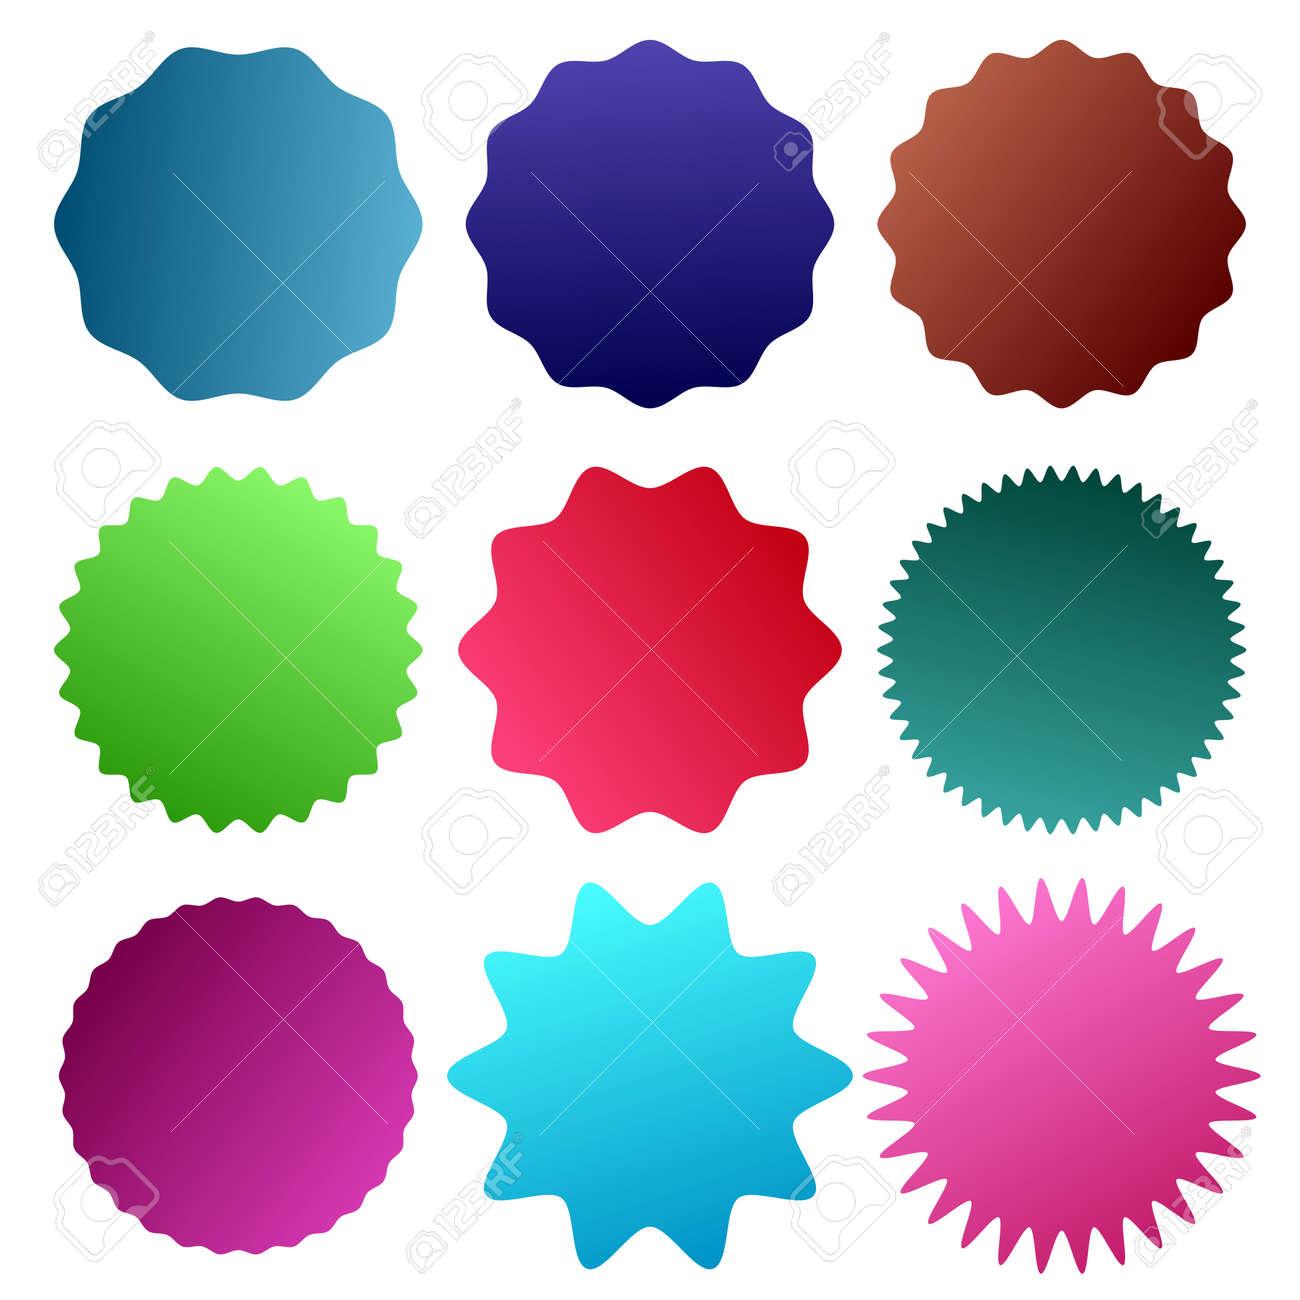 Badge, medal - Starburst, Sunburst Seal vector icon. Round, circle banner, Sticker or Vignette shape - Royalty free stock vector illustration, clip-art - 167445508